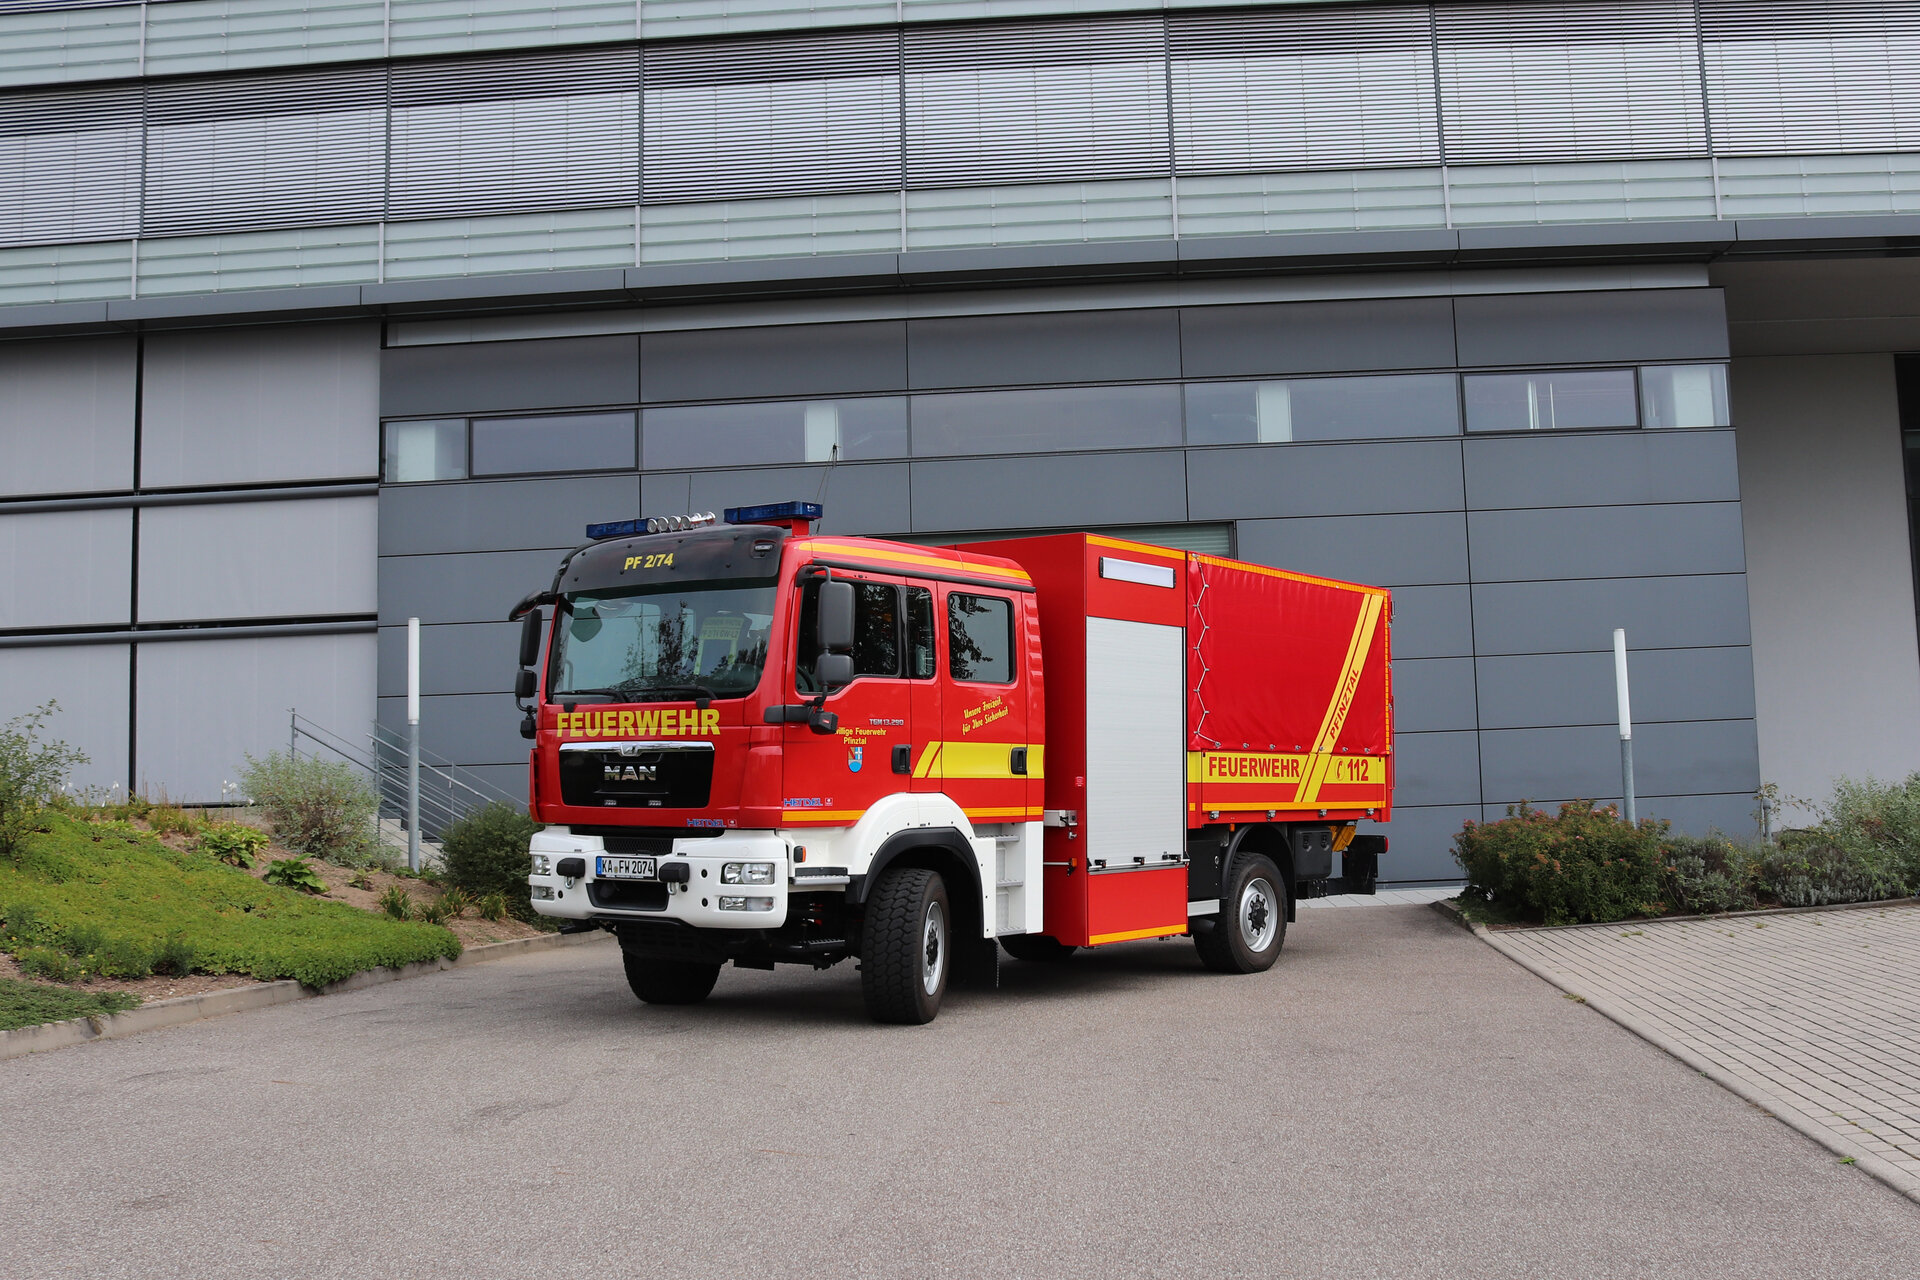 Gerätewagen-Logistik 2 (GW-L2)